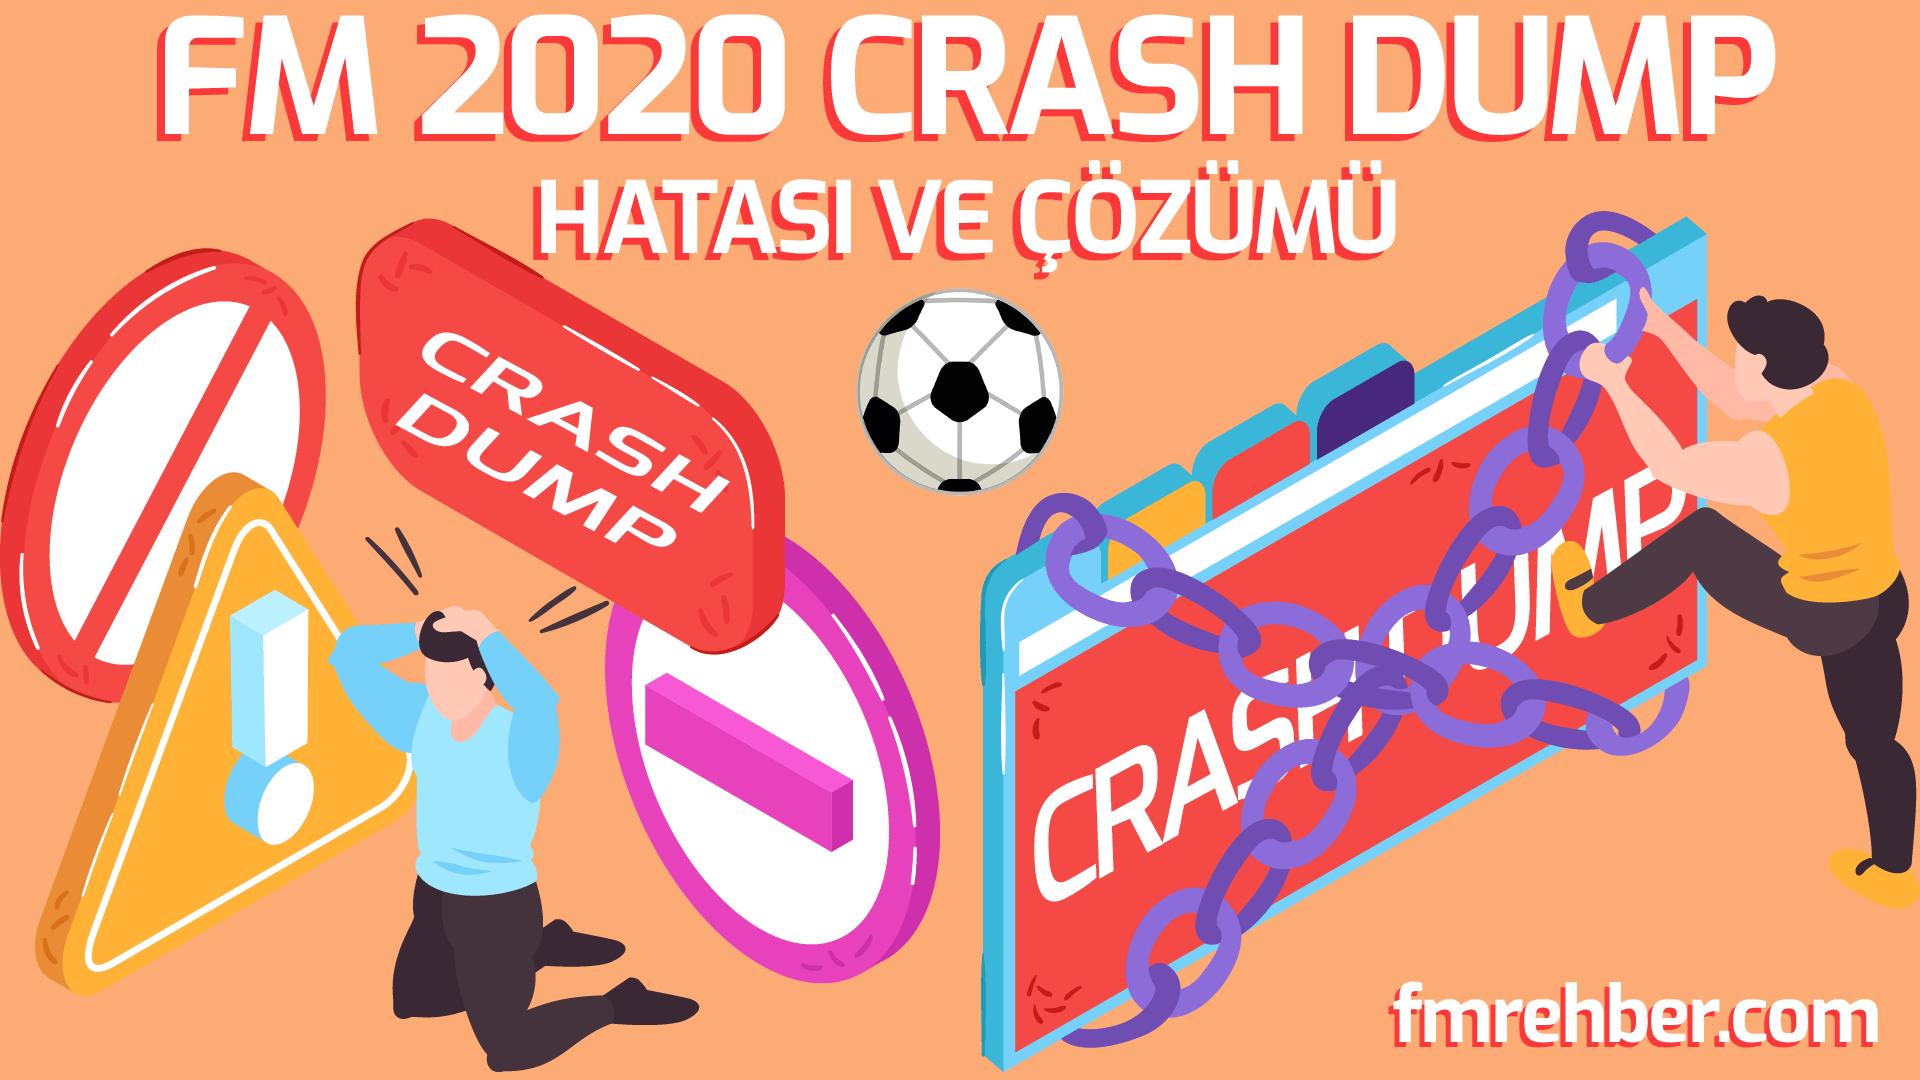 fm 2020 crash dump